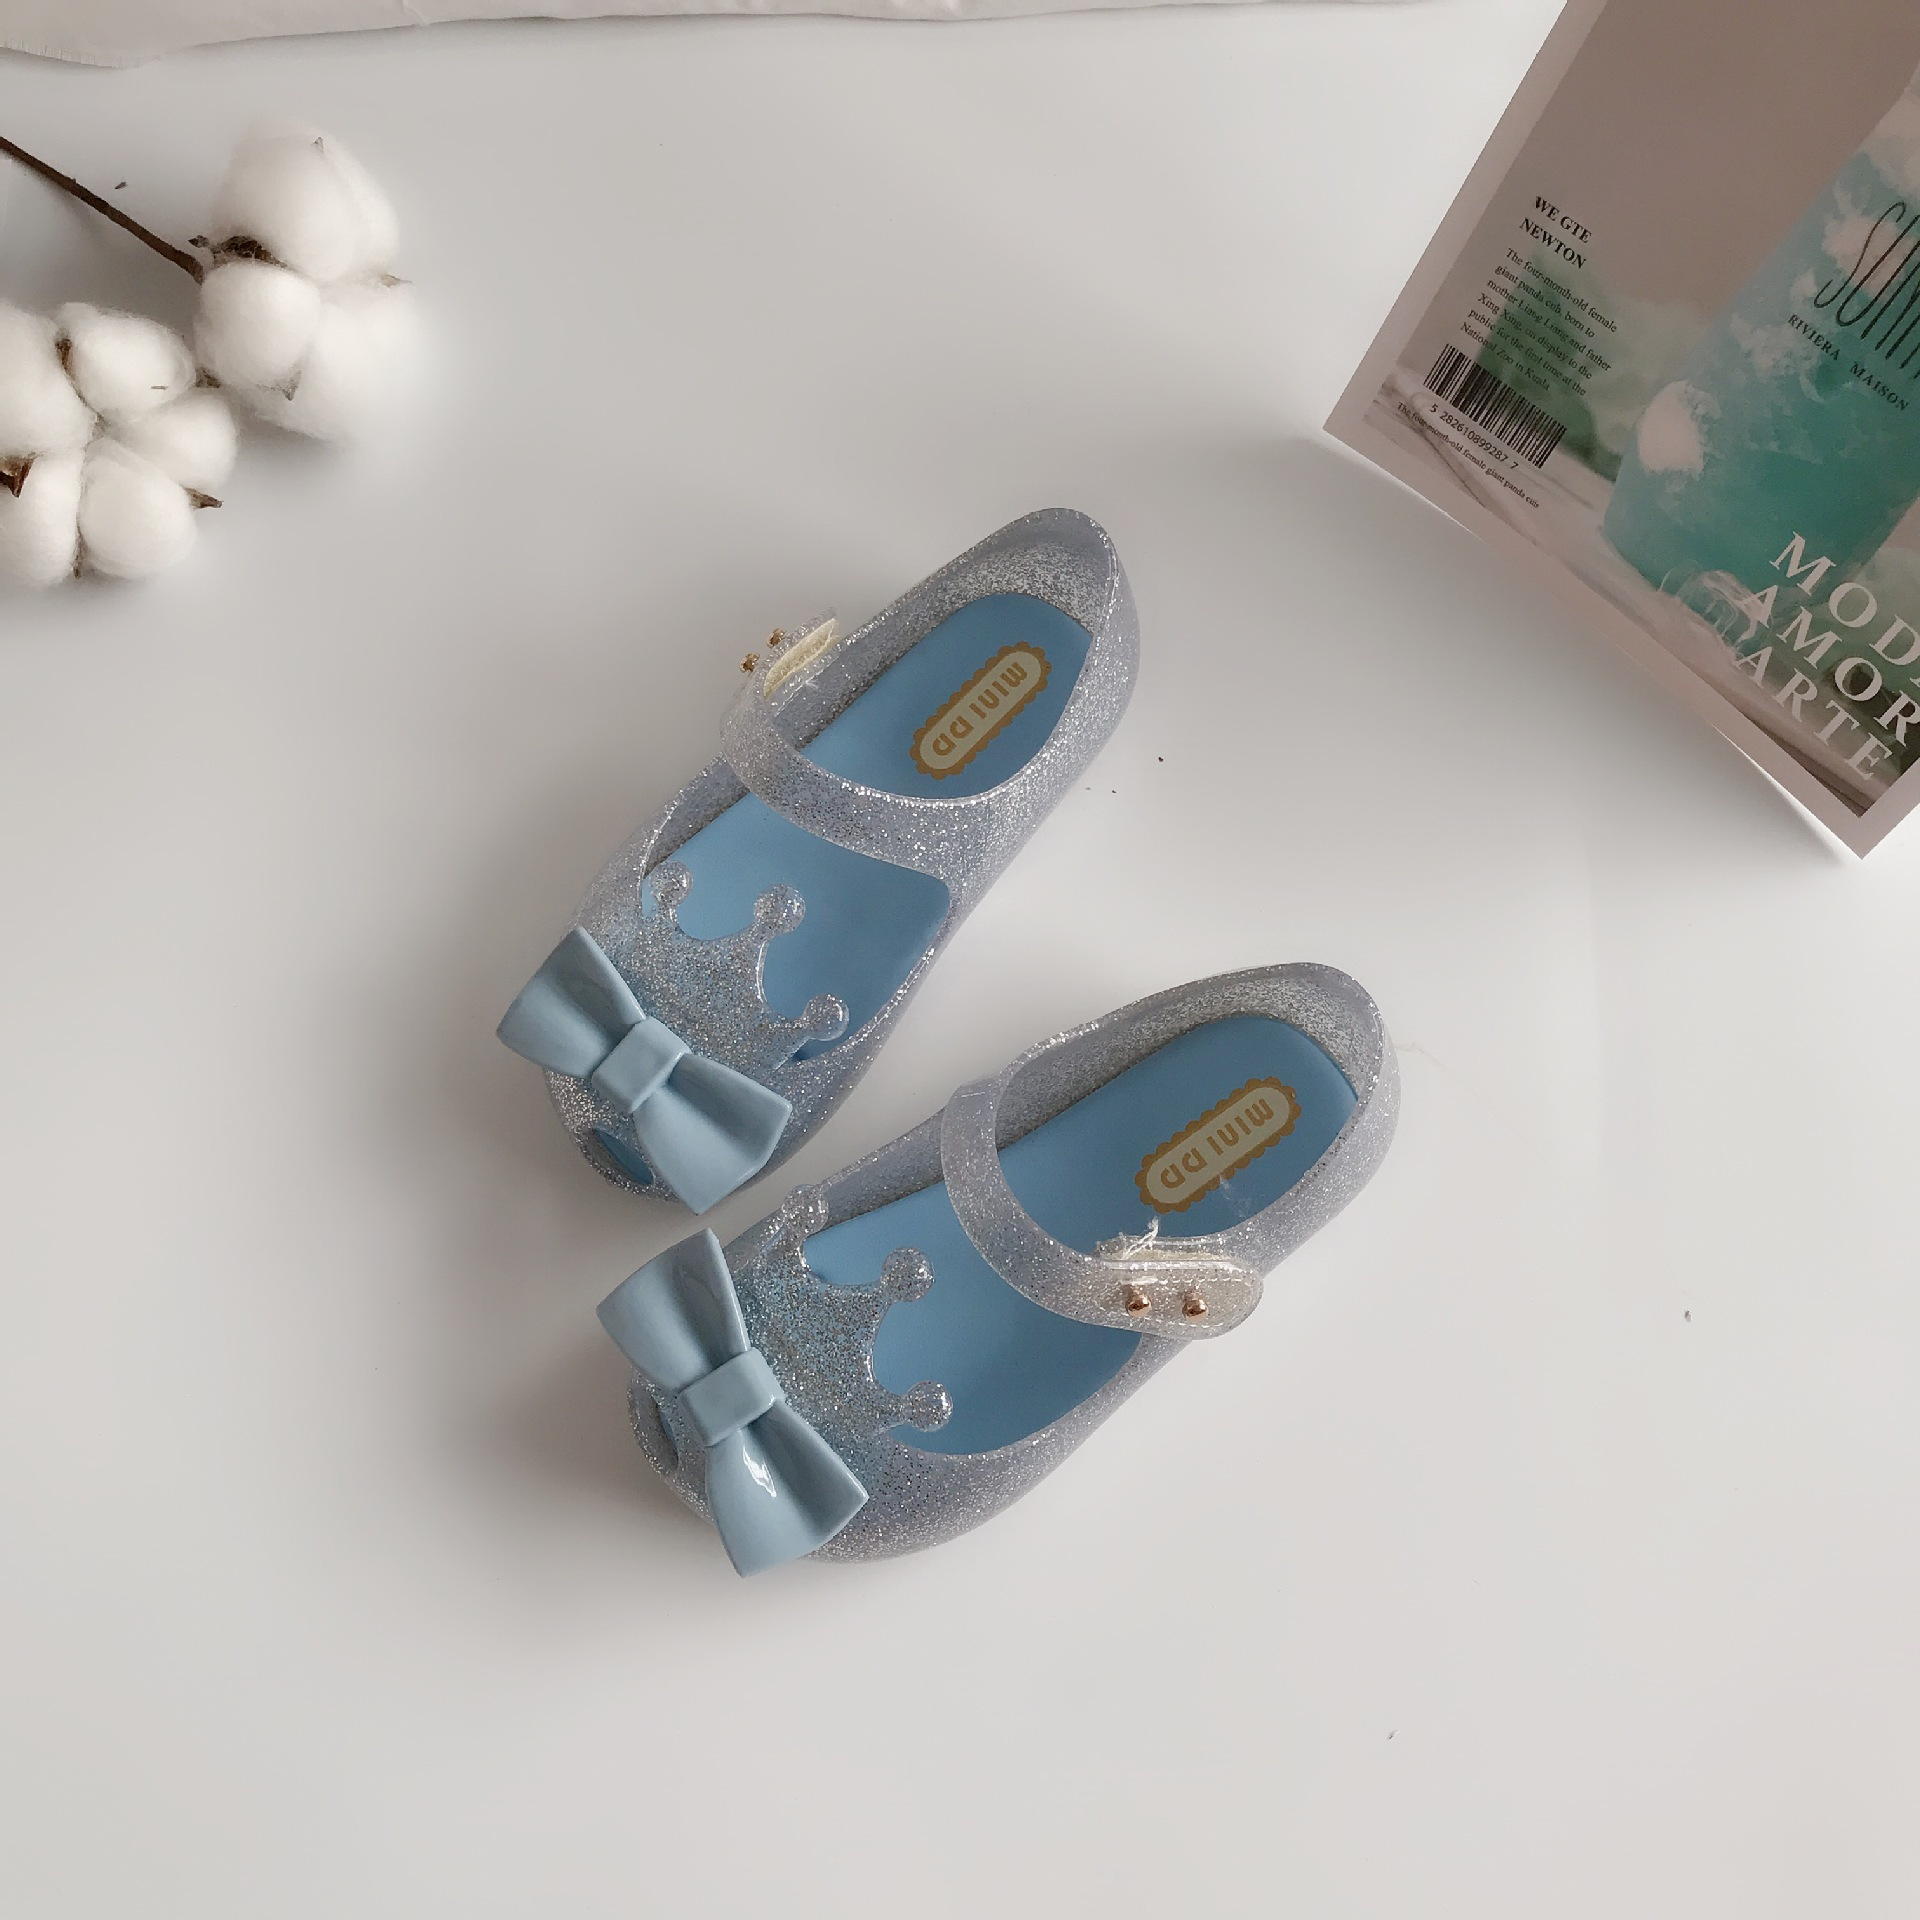 Mini Melissa 2020 Boy Girl Bow Jelly Shoes Sandals New Baby Shoes Melissa Sandals For Kids Non-slip Sandalias